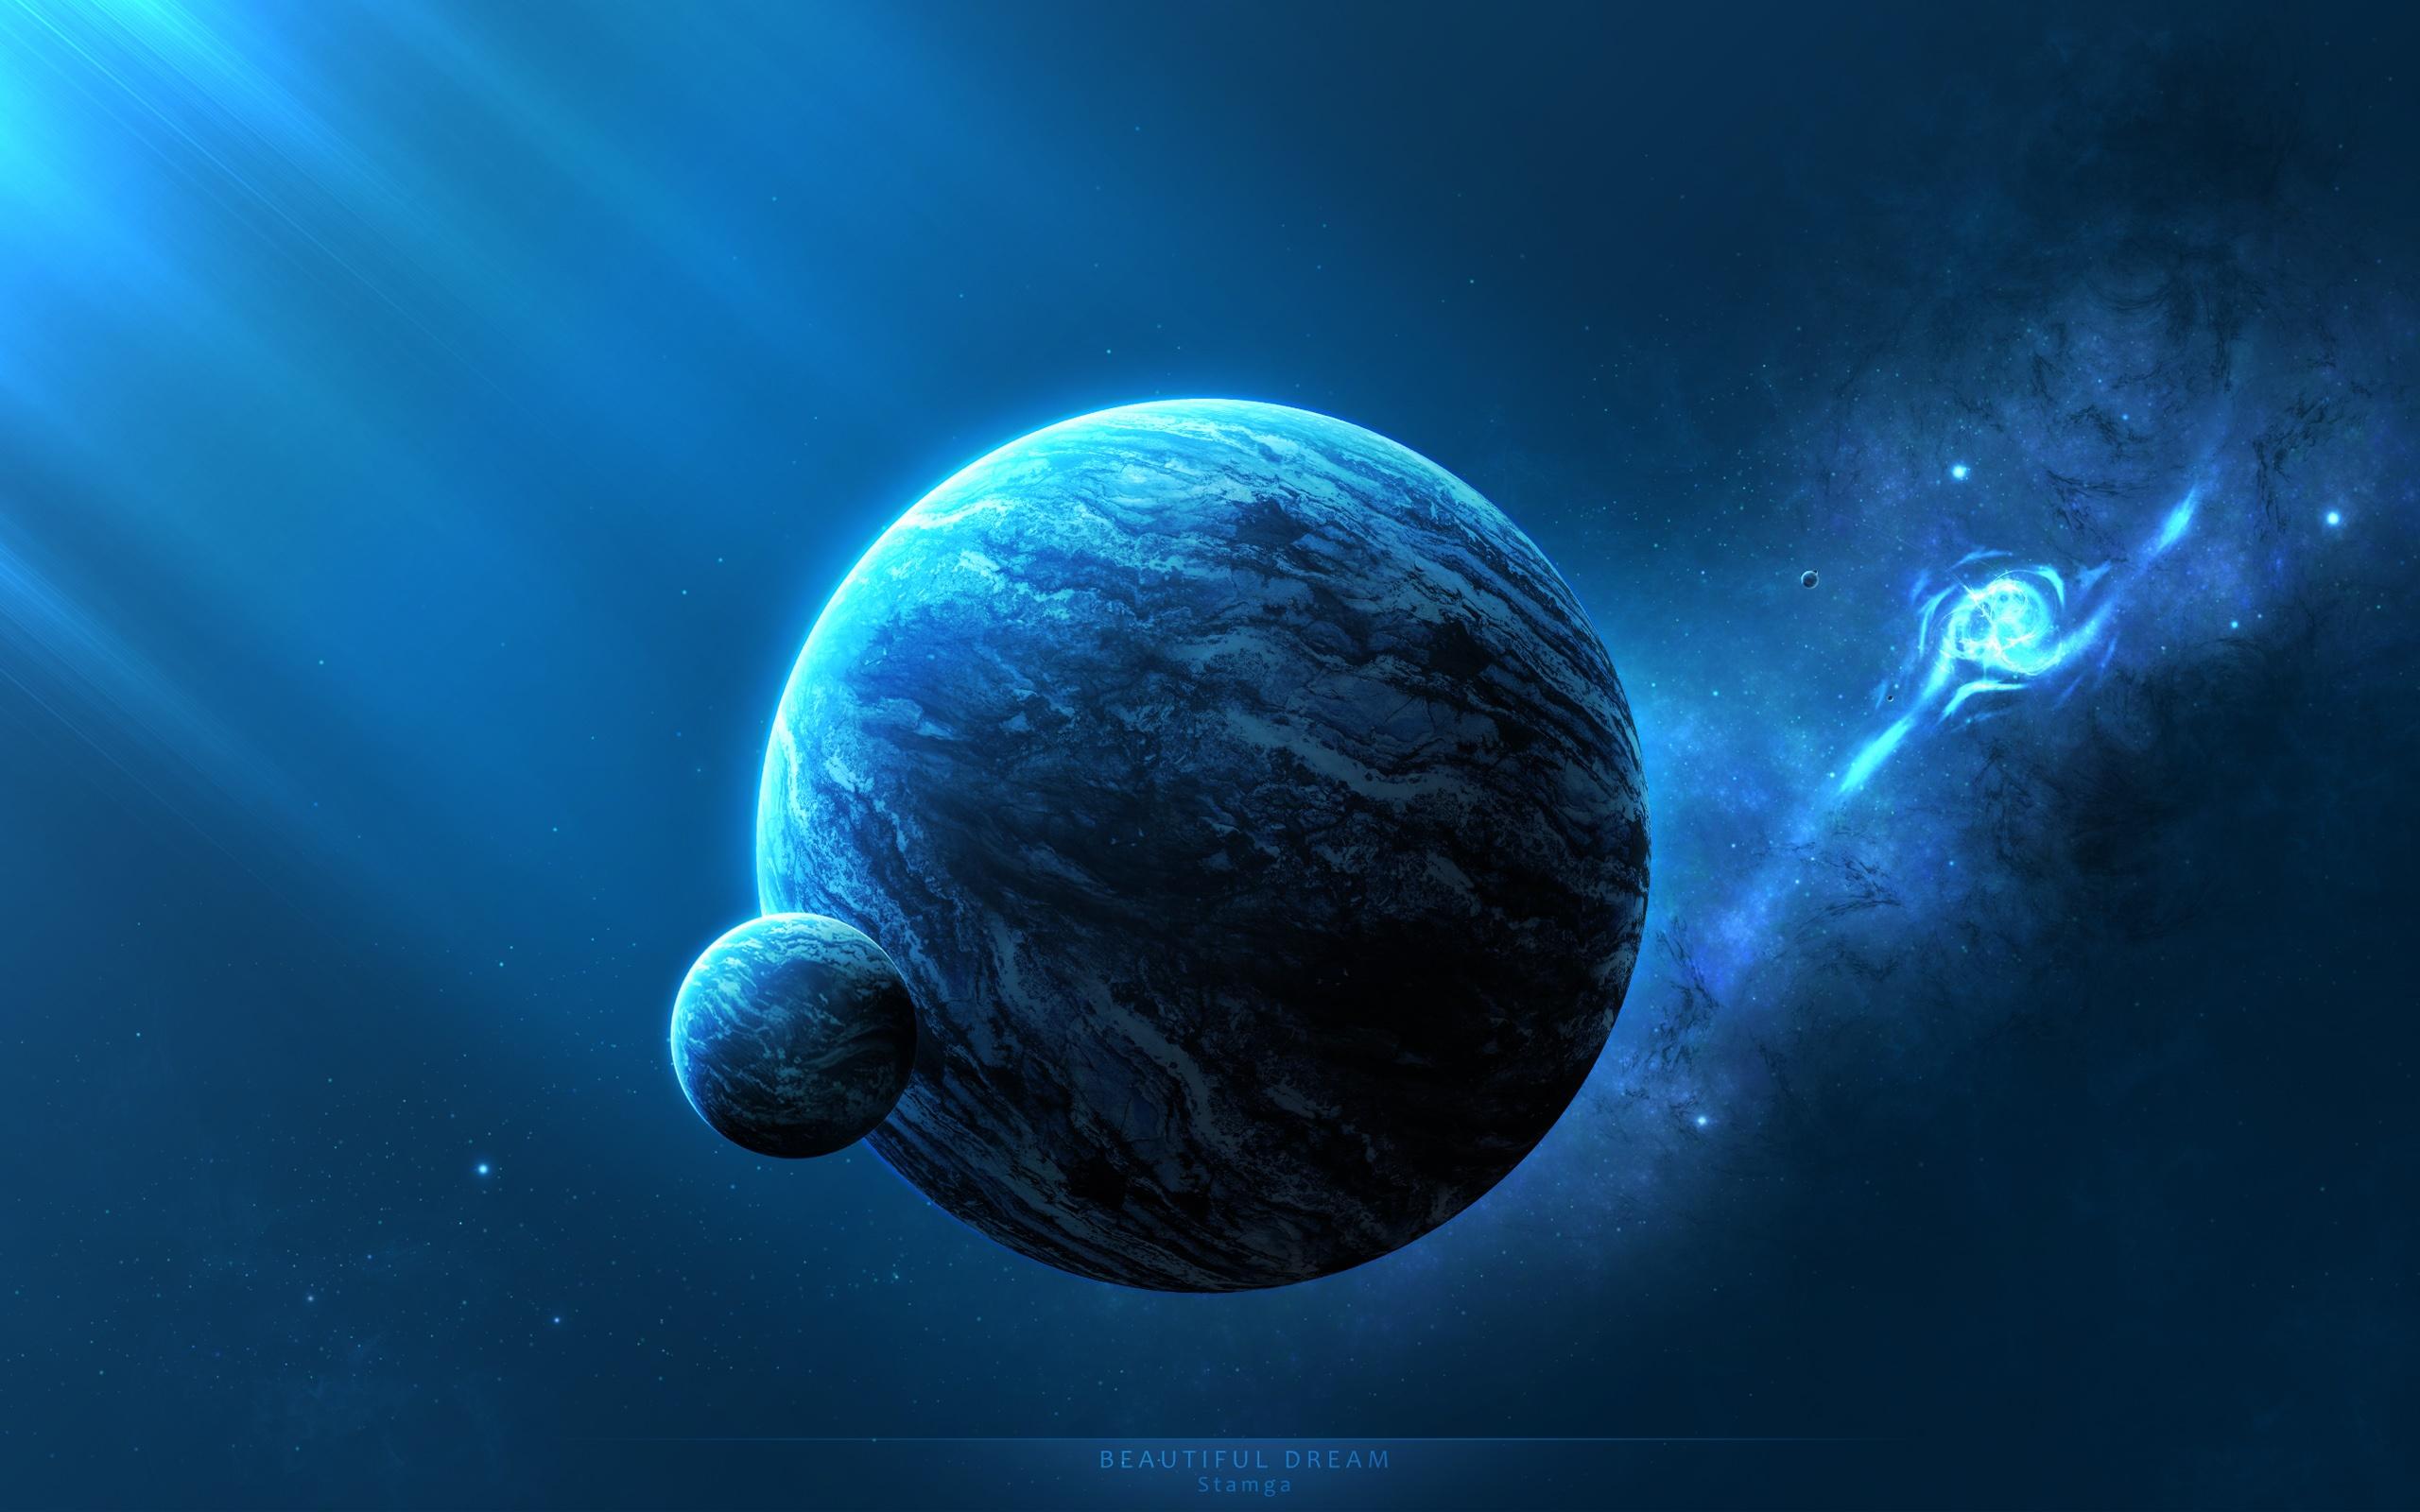 Digital Universe Wallpaper Wallpapers of digital universe 2560x1600